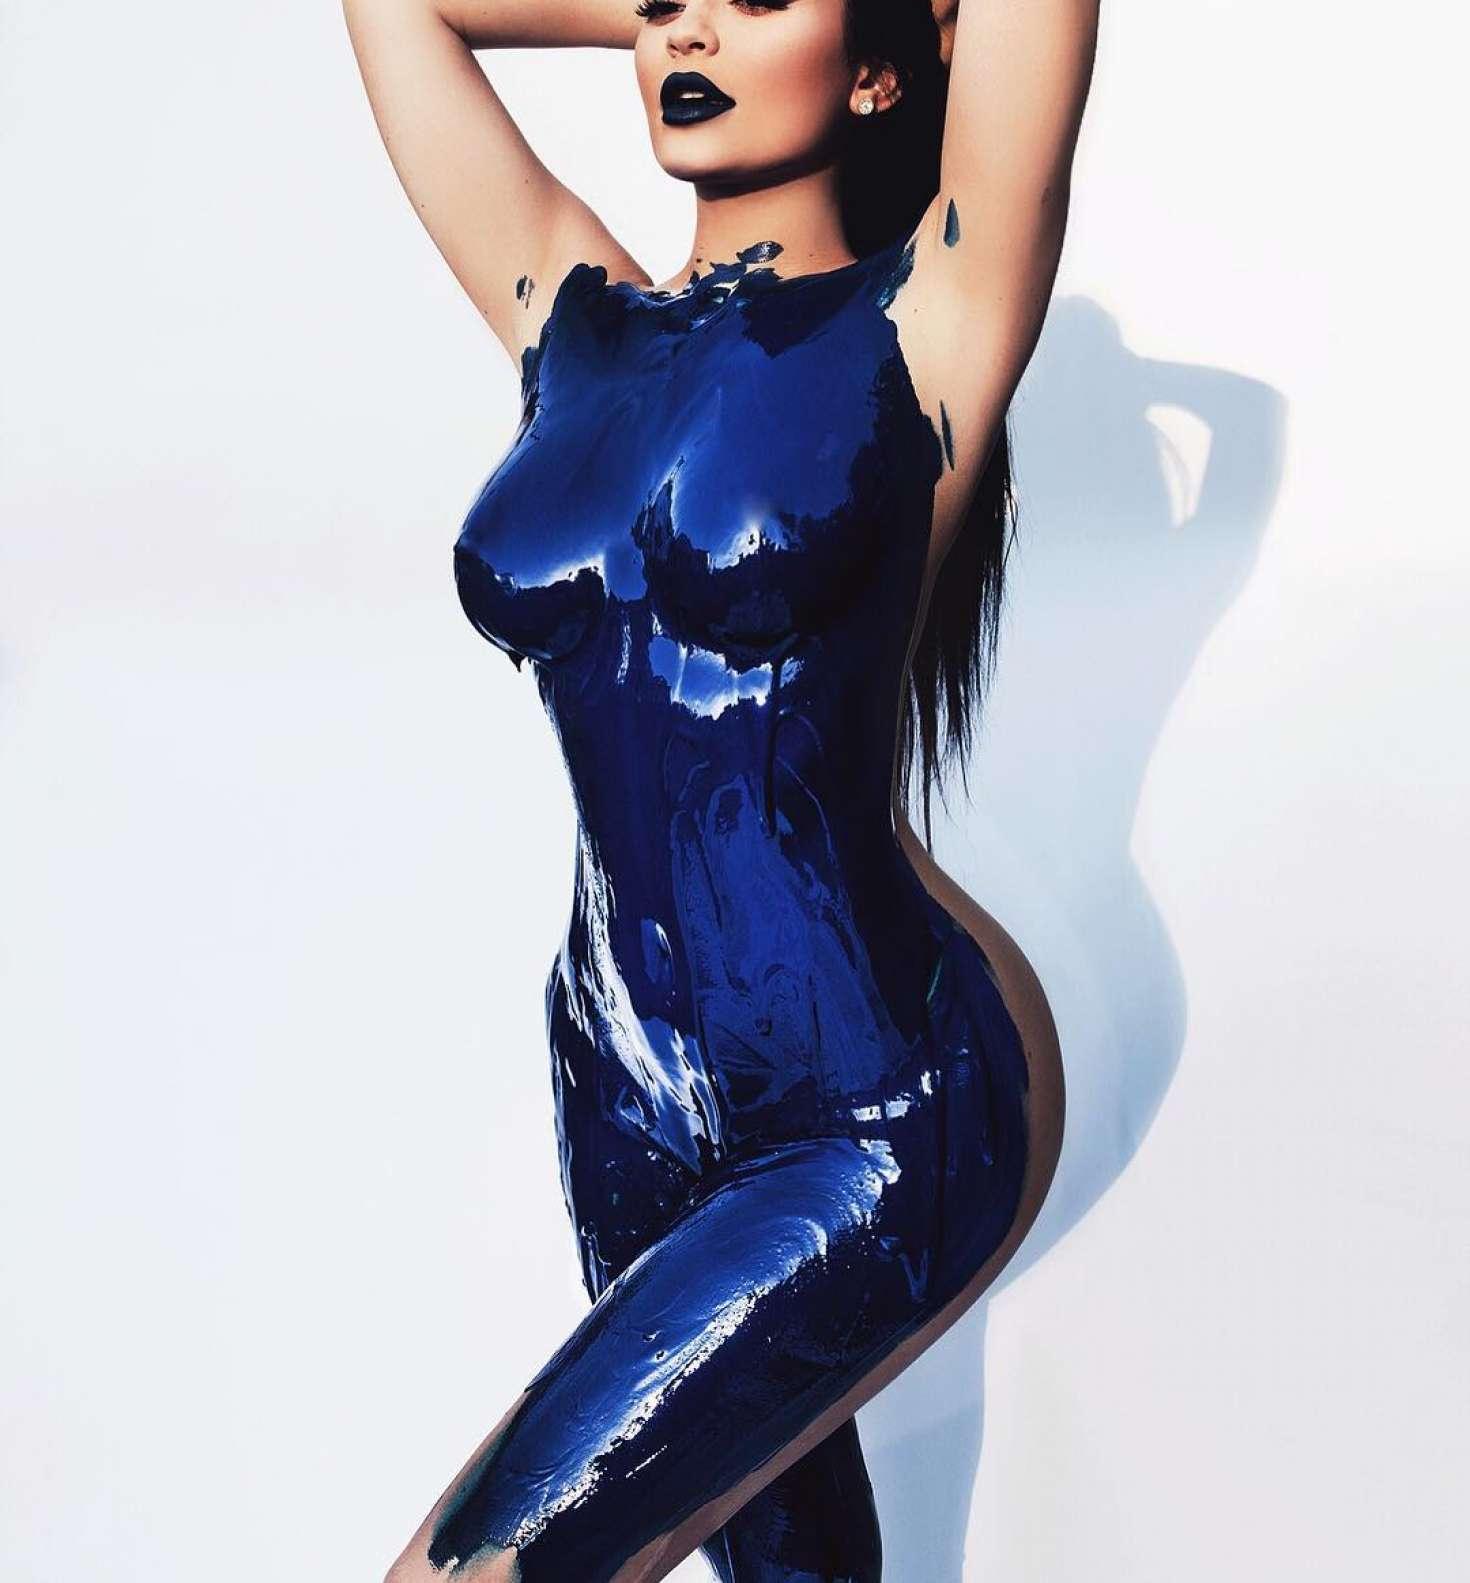 kylie jenner in body paint   sasha samsonova photoshoot